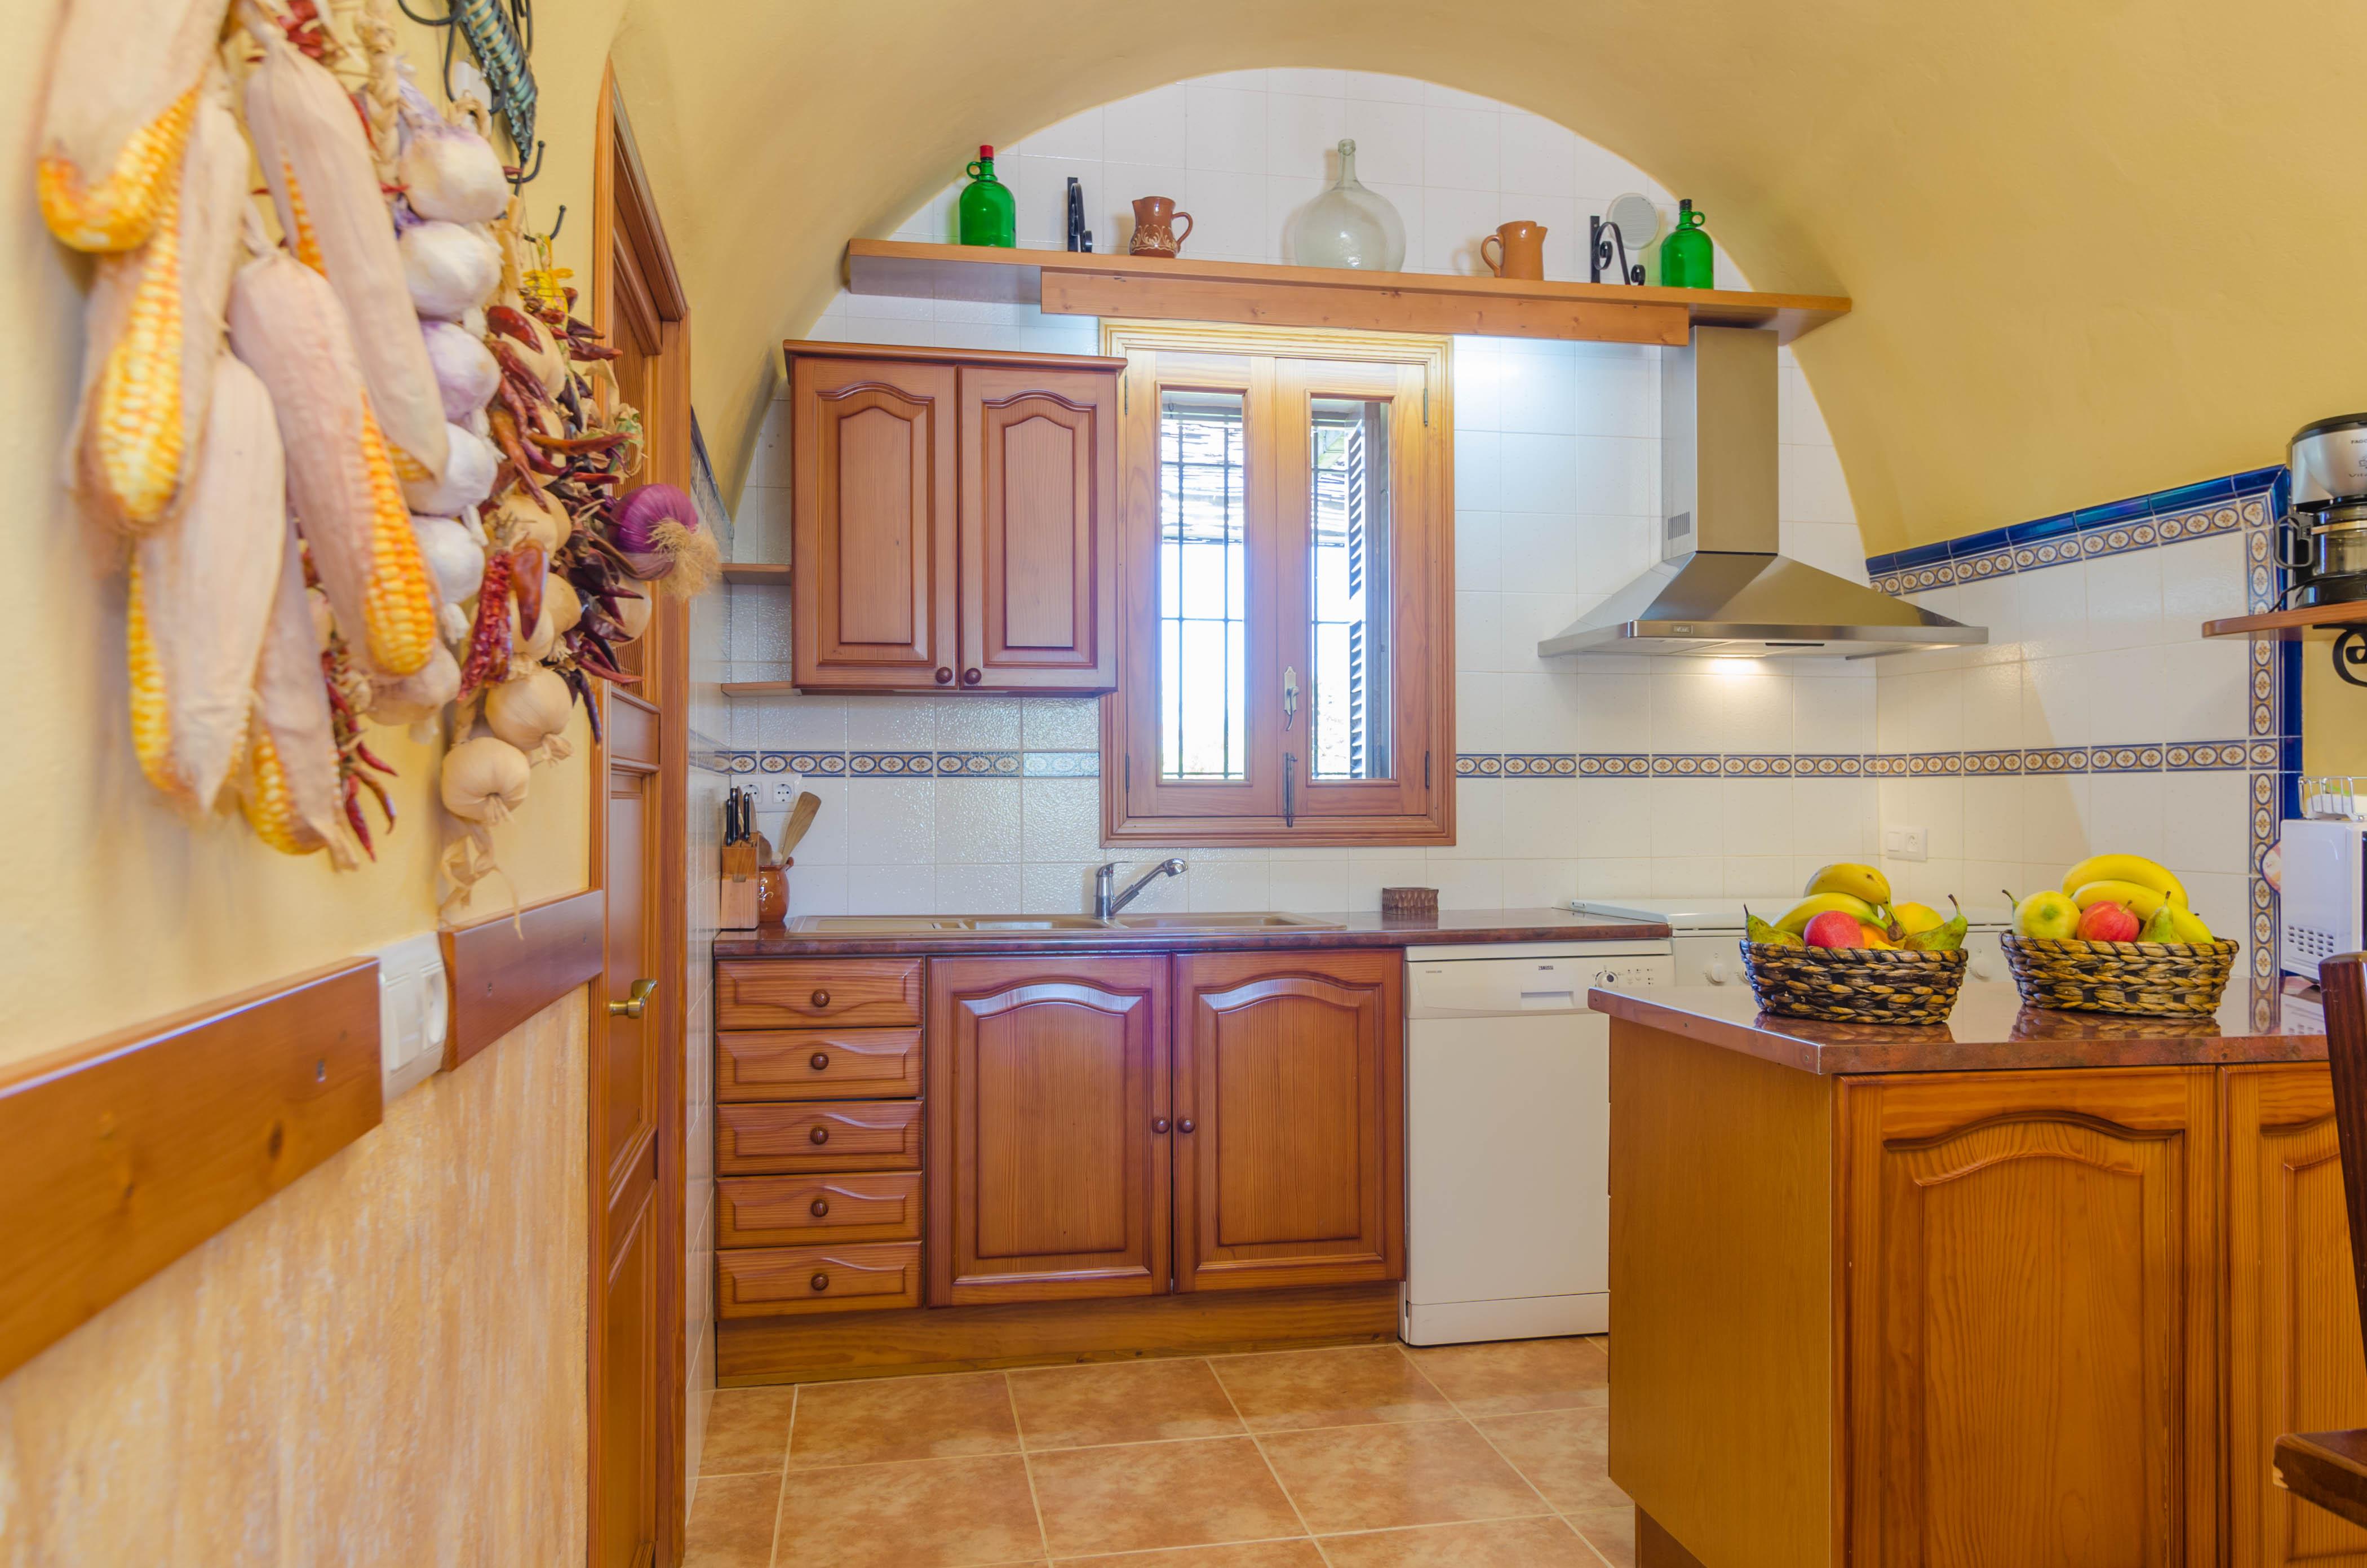 Ferienhaus SON MACIA (2186582), Son Macià, Mallorca, Balearische Inseln, Spanien, Bild 19